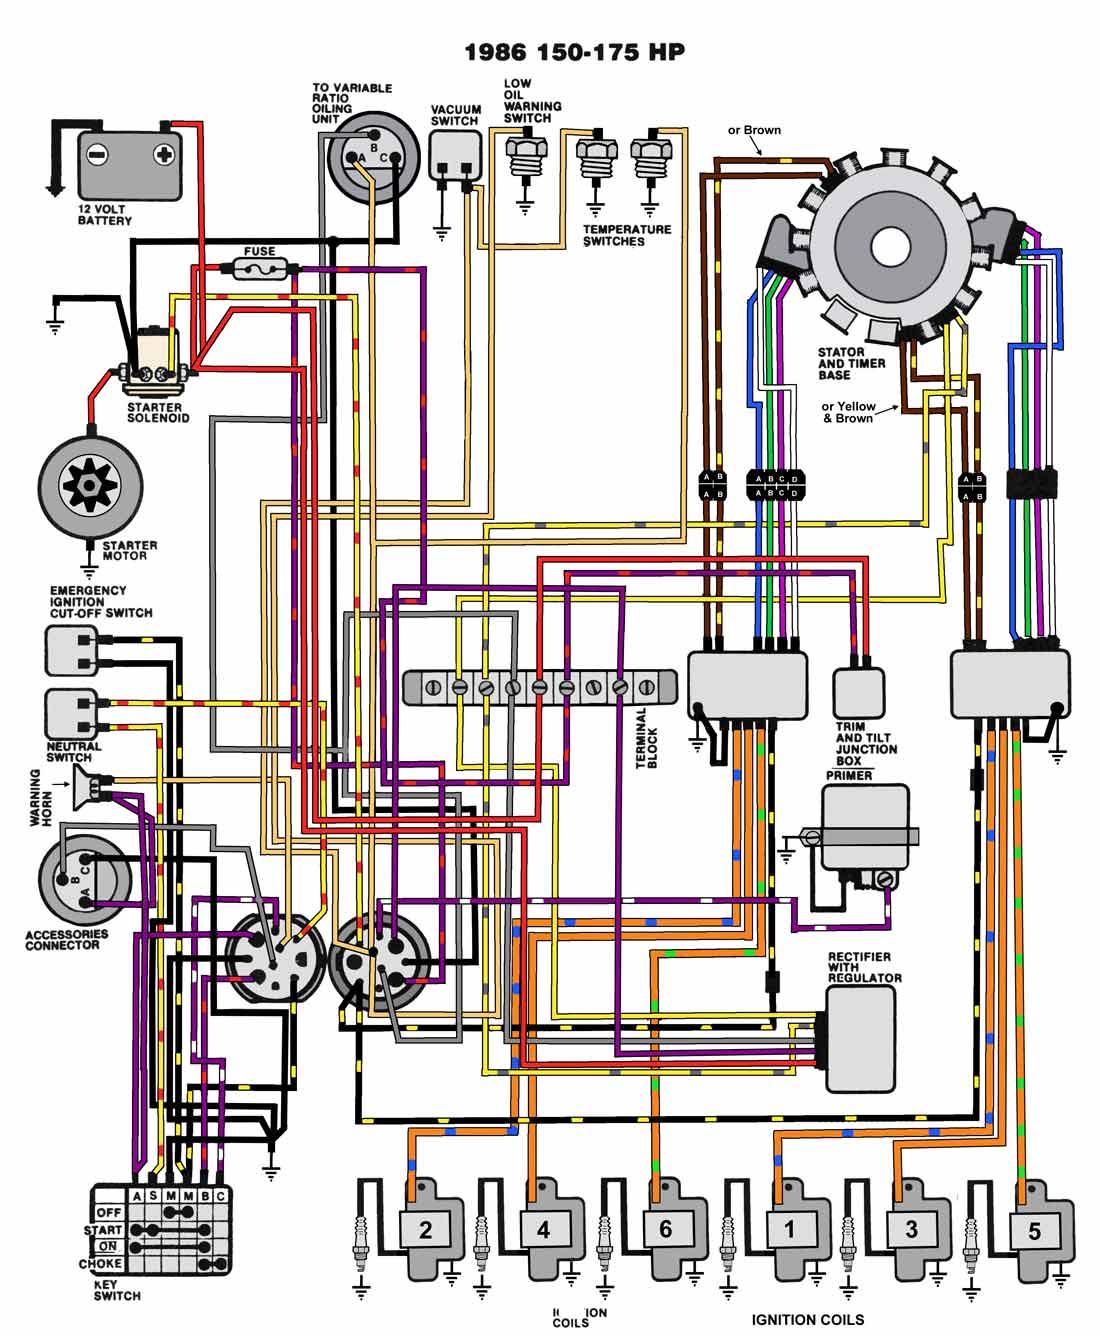 1986_150_175?resize=665%2C808 johnson 150 outboard wiring diagram wiring diagram,50 Hp Mercury Outboard Wiring Diagram Mastertech Marine